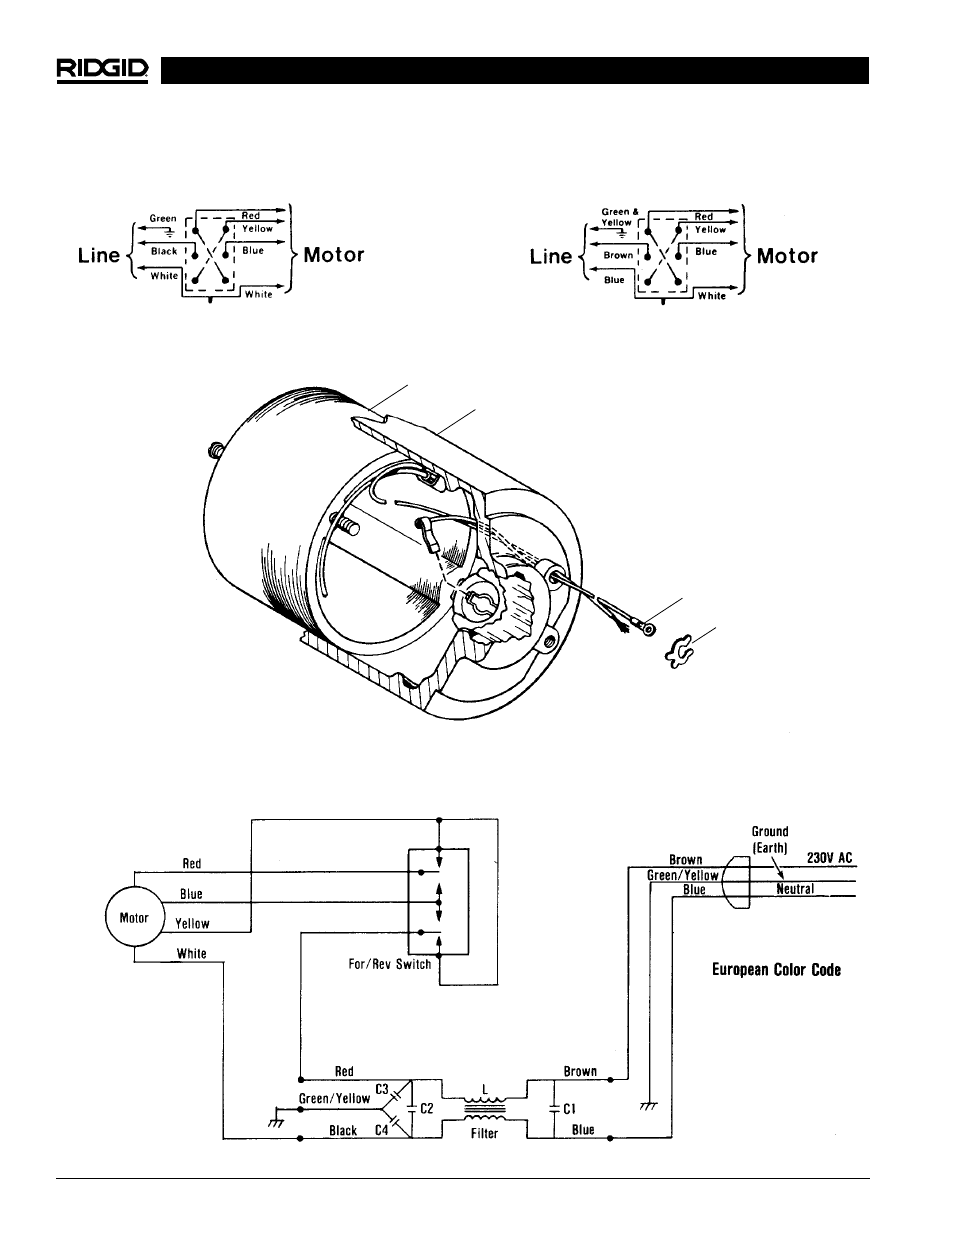 ridgid 700 switch wiring diagram